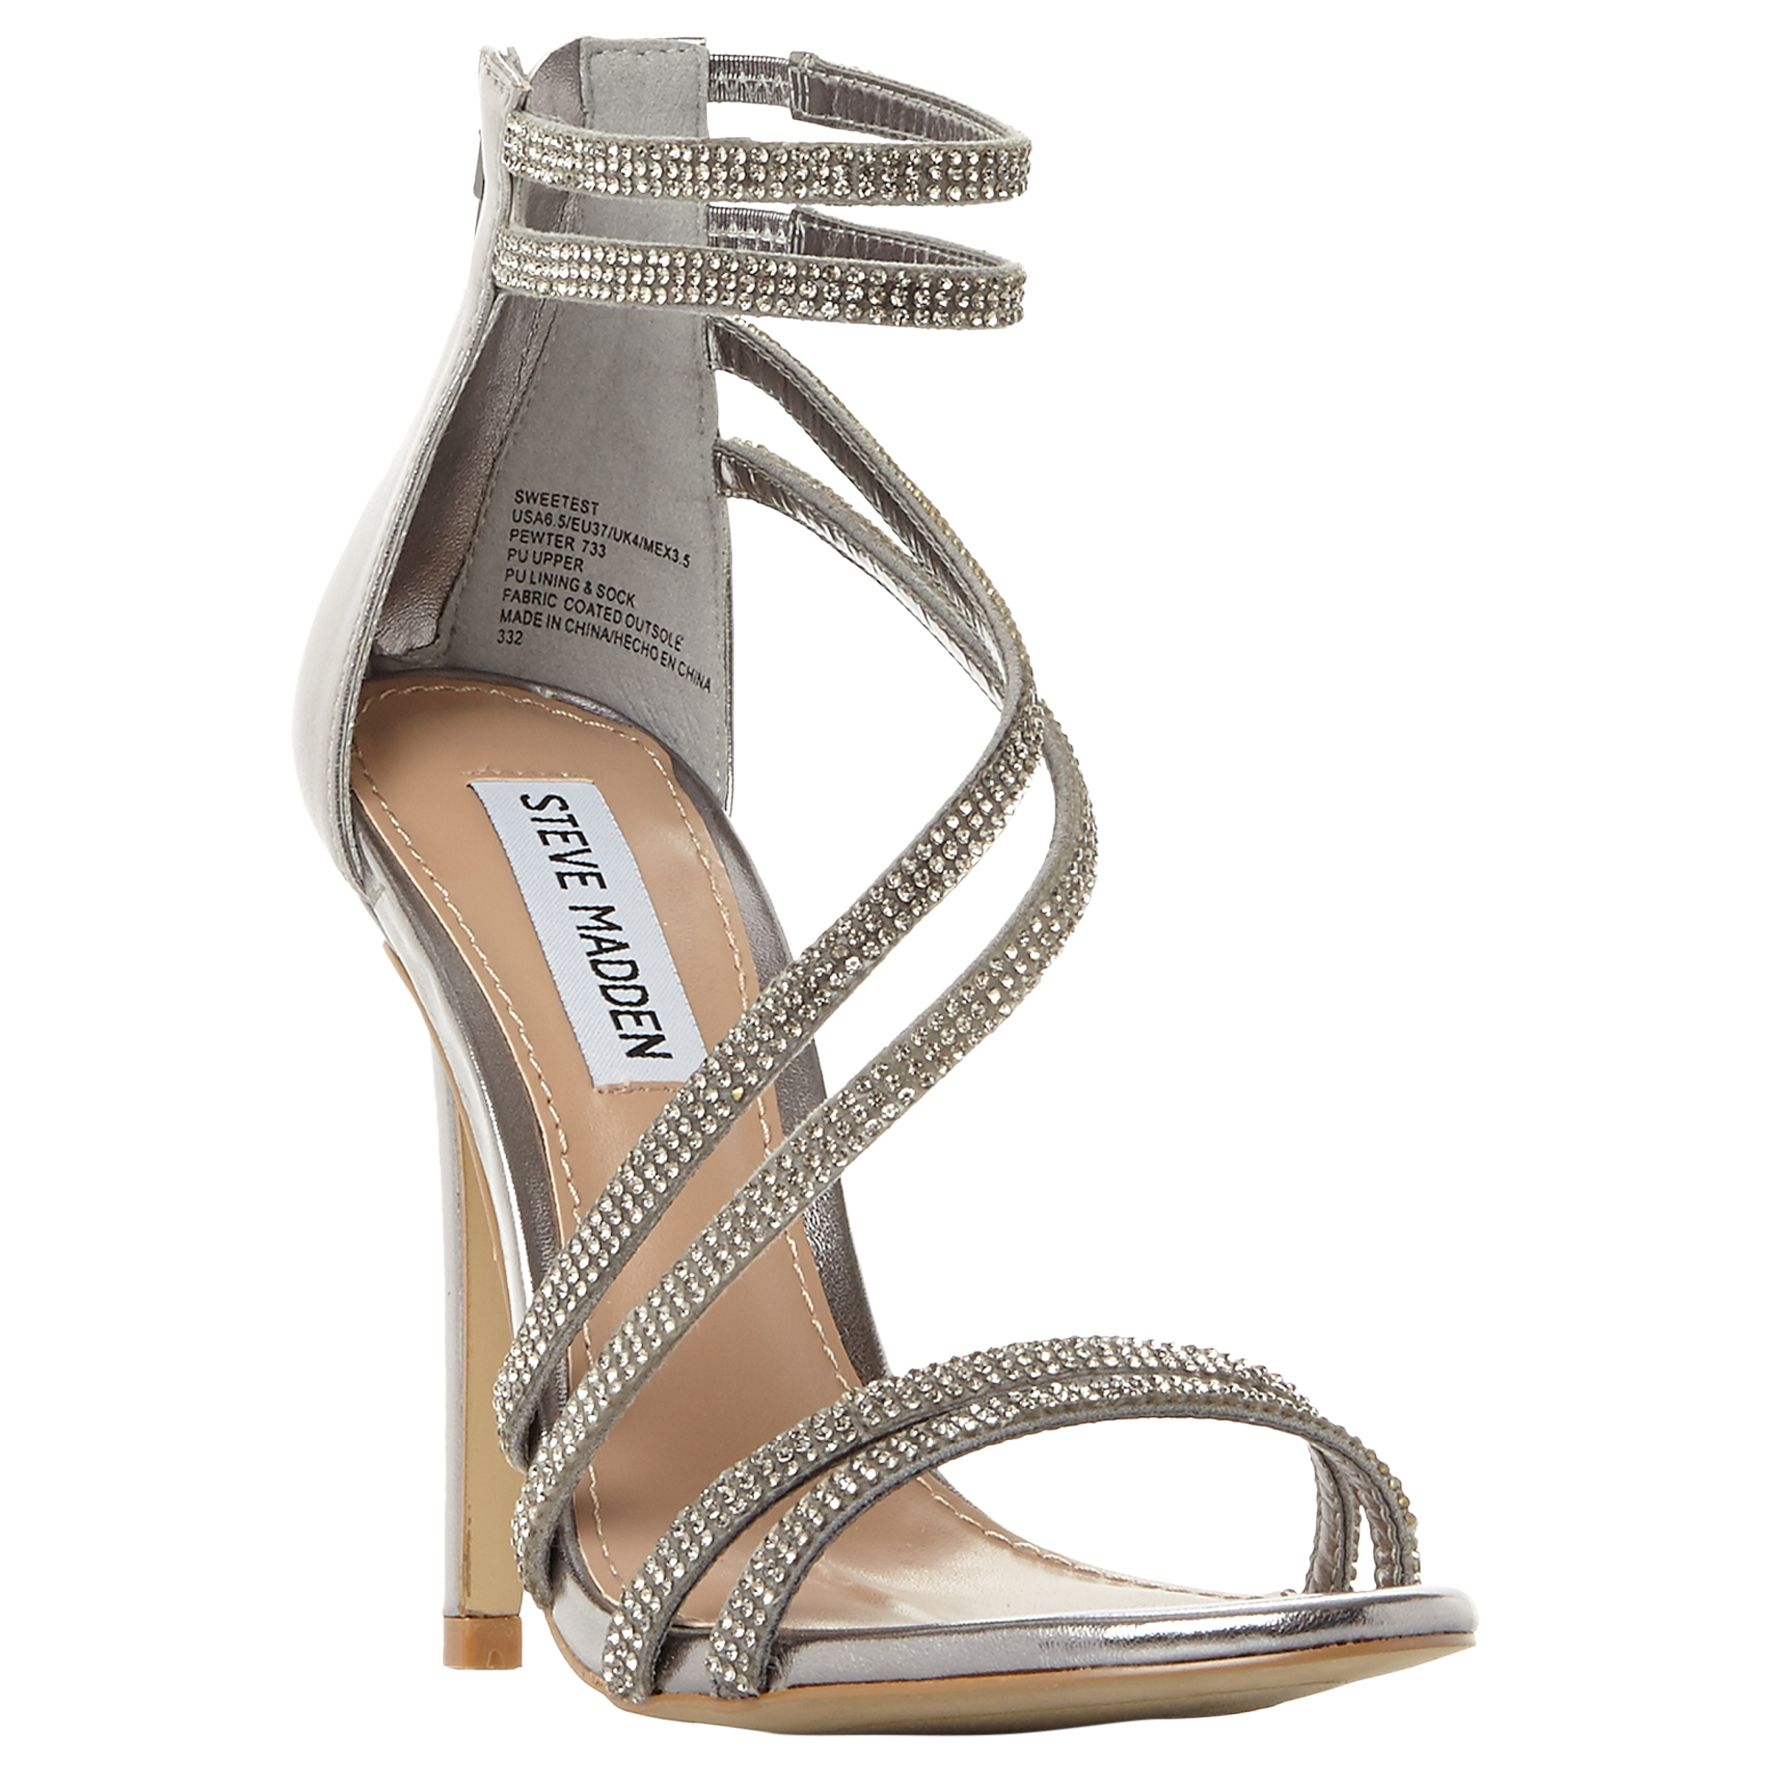 b98627a3400 Steve Madden Sweetest Multi Strap Sandals at John Lewis & Partners